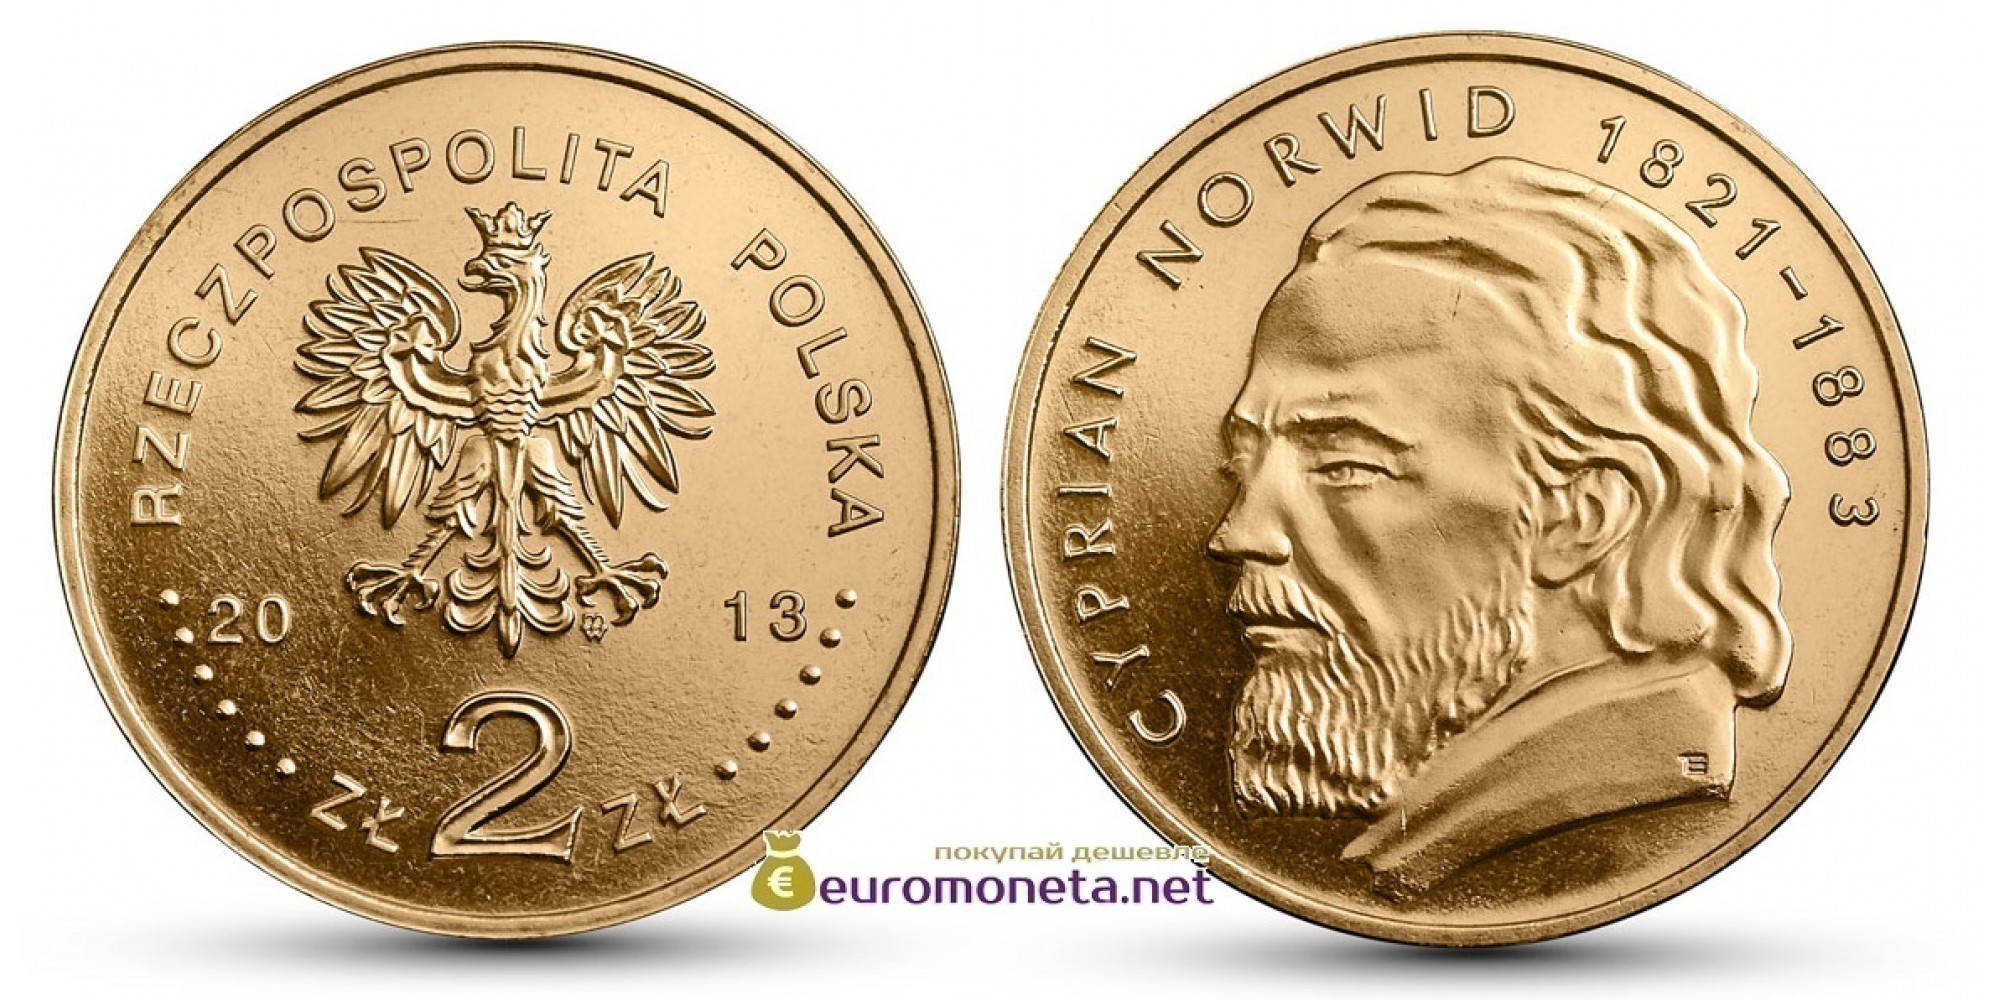 Польша 2 злотых 2013 год Циприан Норвид (Cyprian Norwid) АЦ из запайки